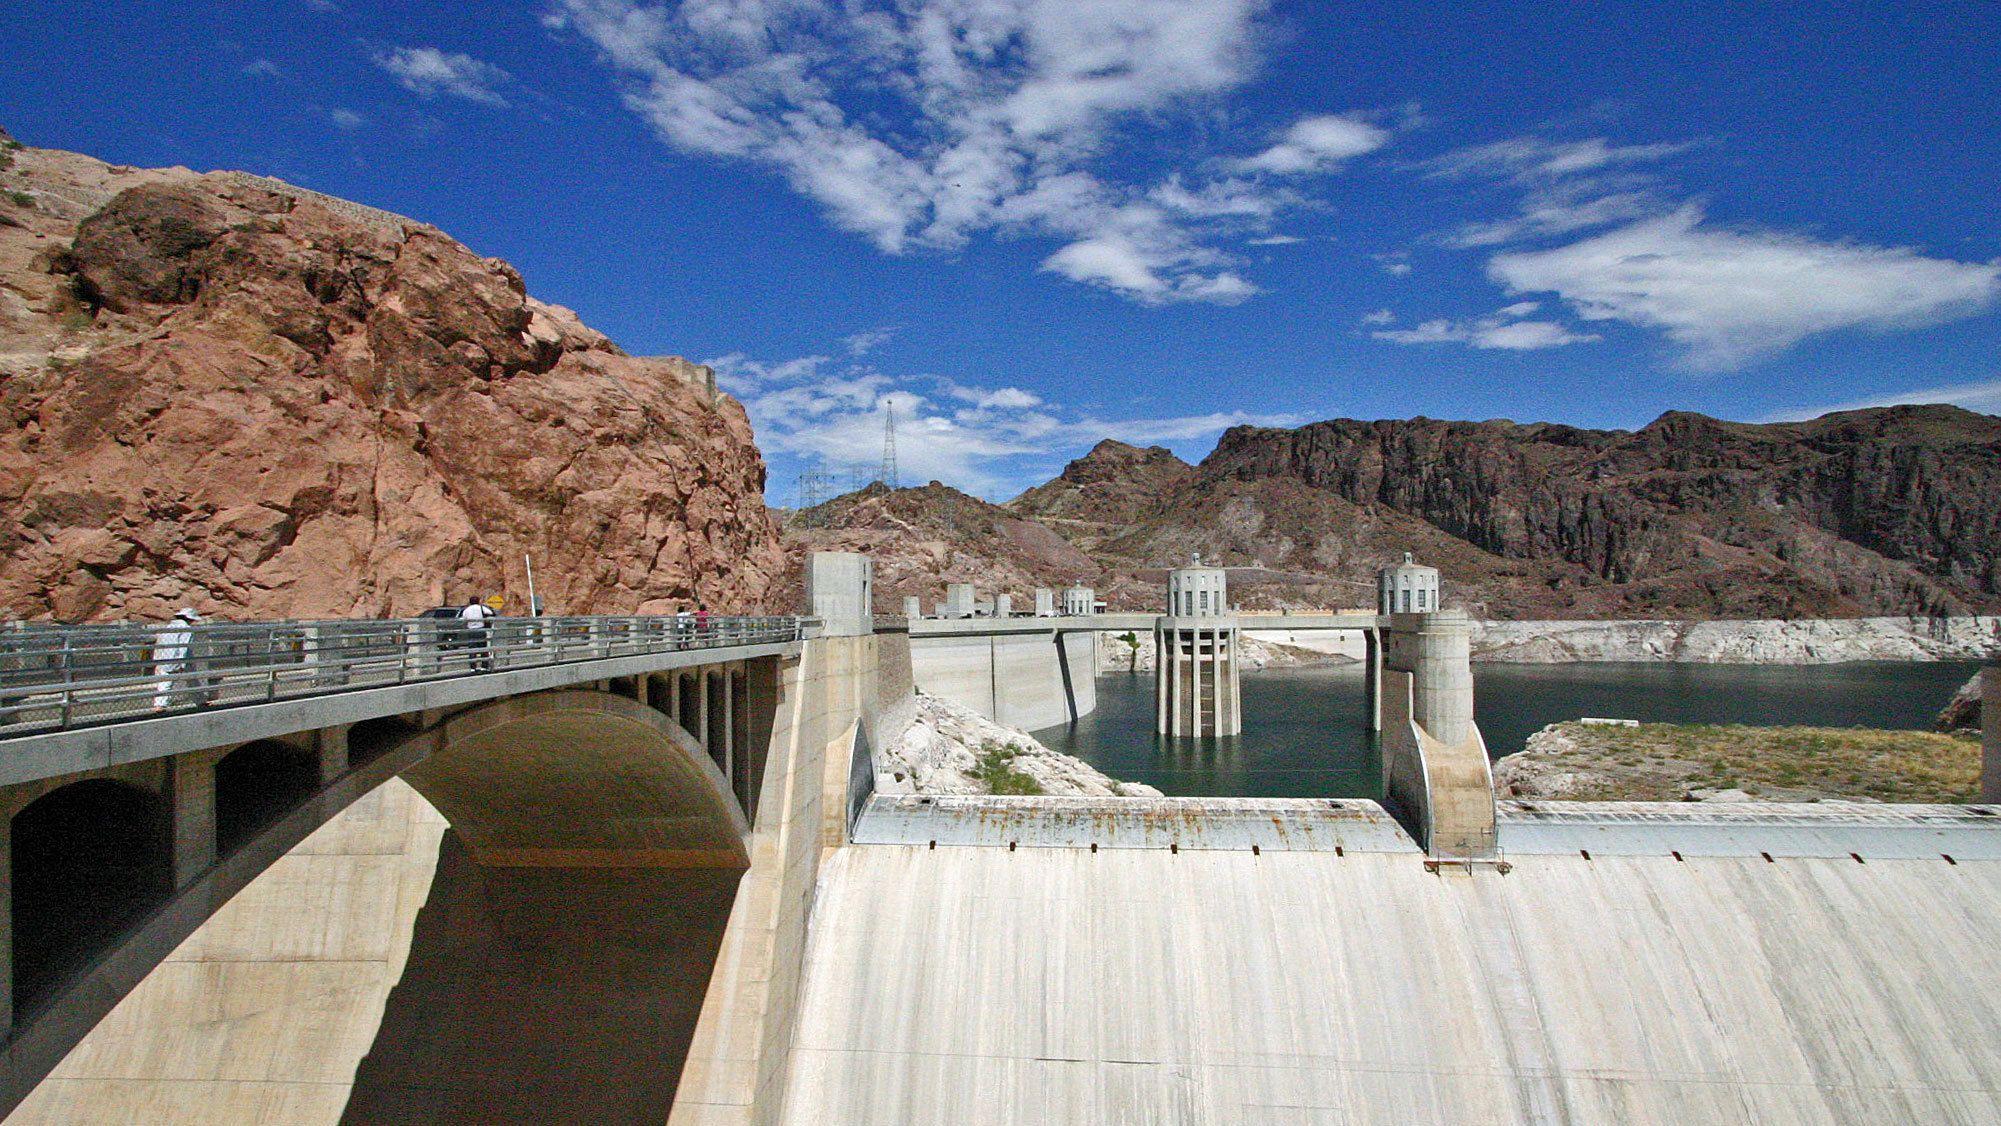 Hoover Dam at daytime